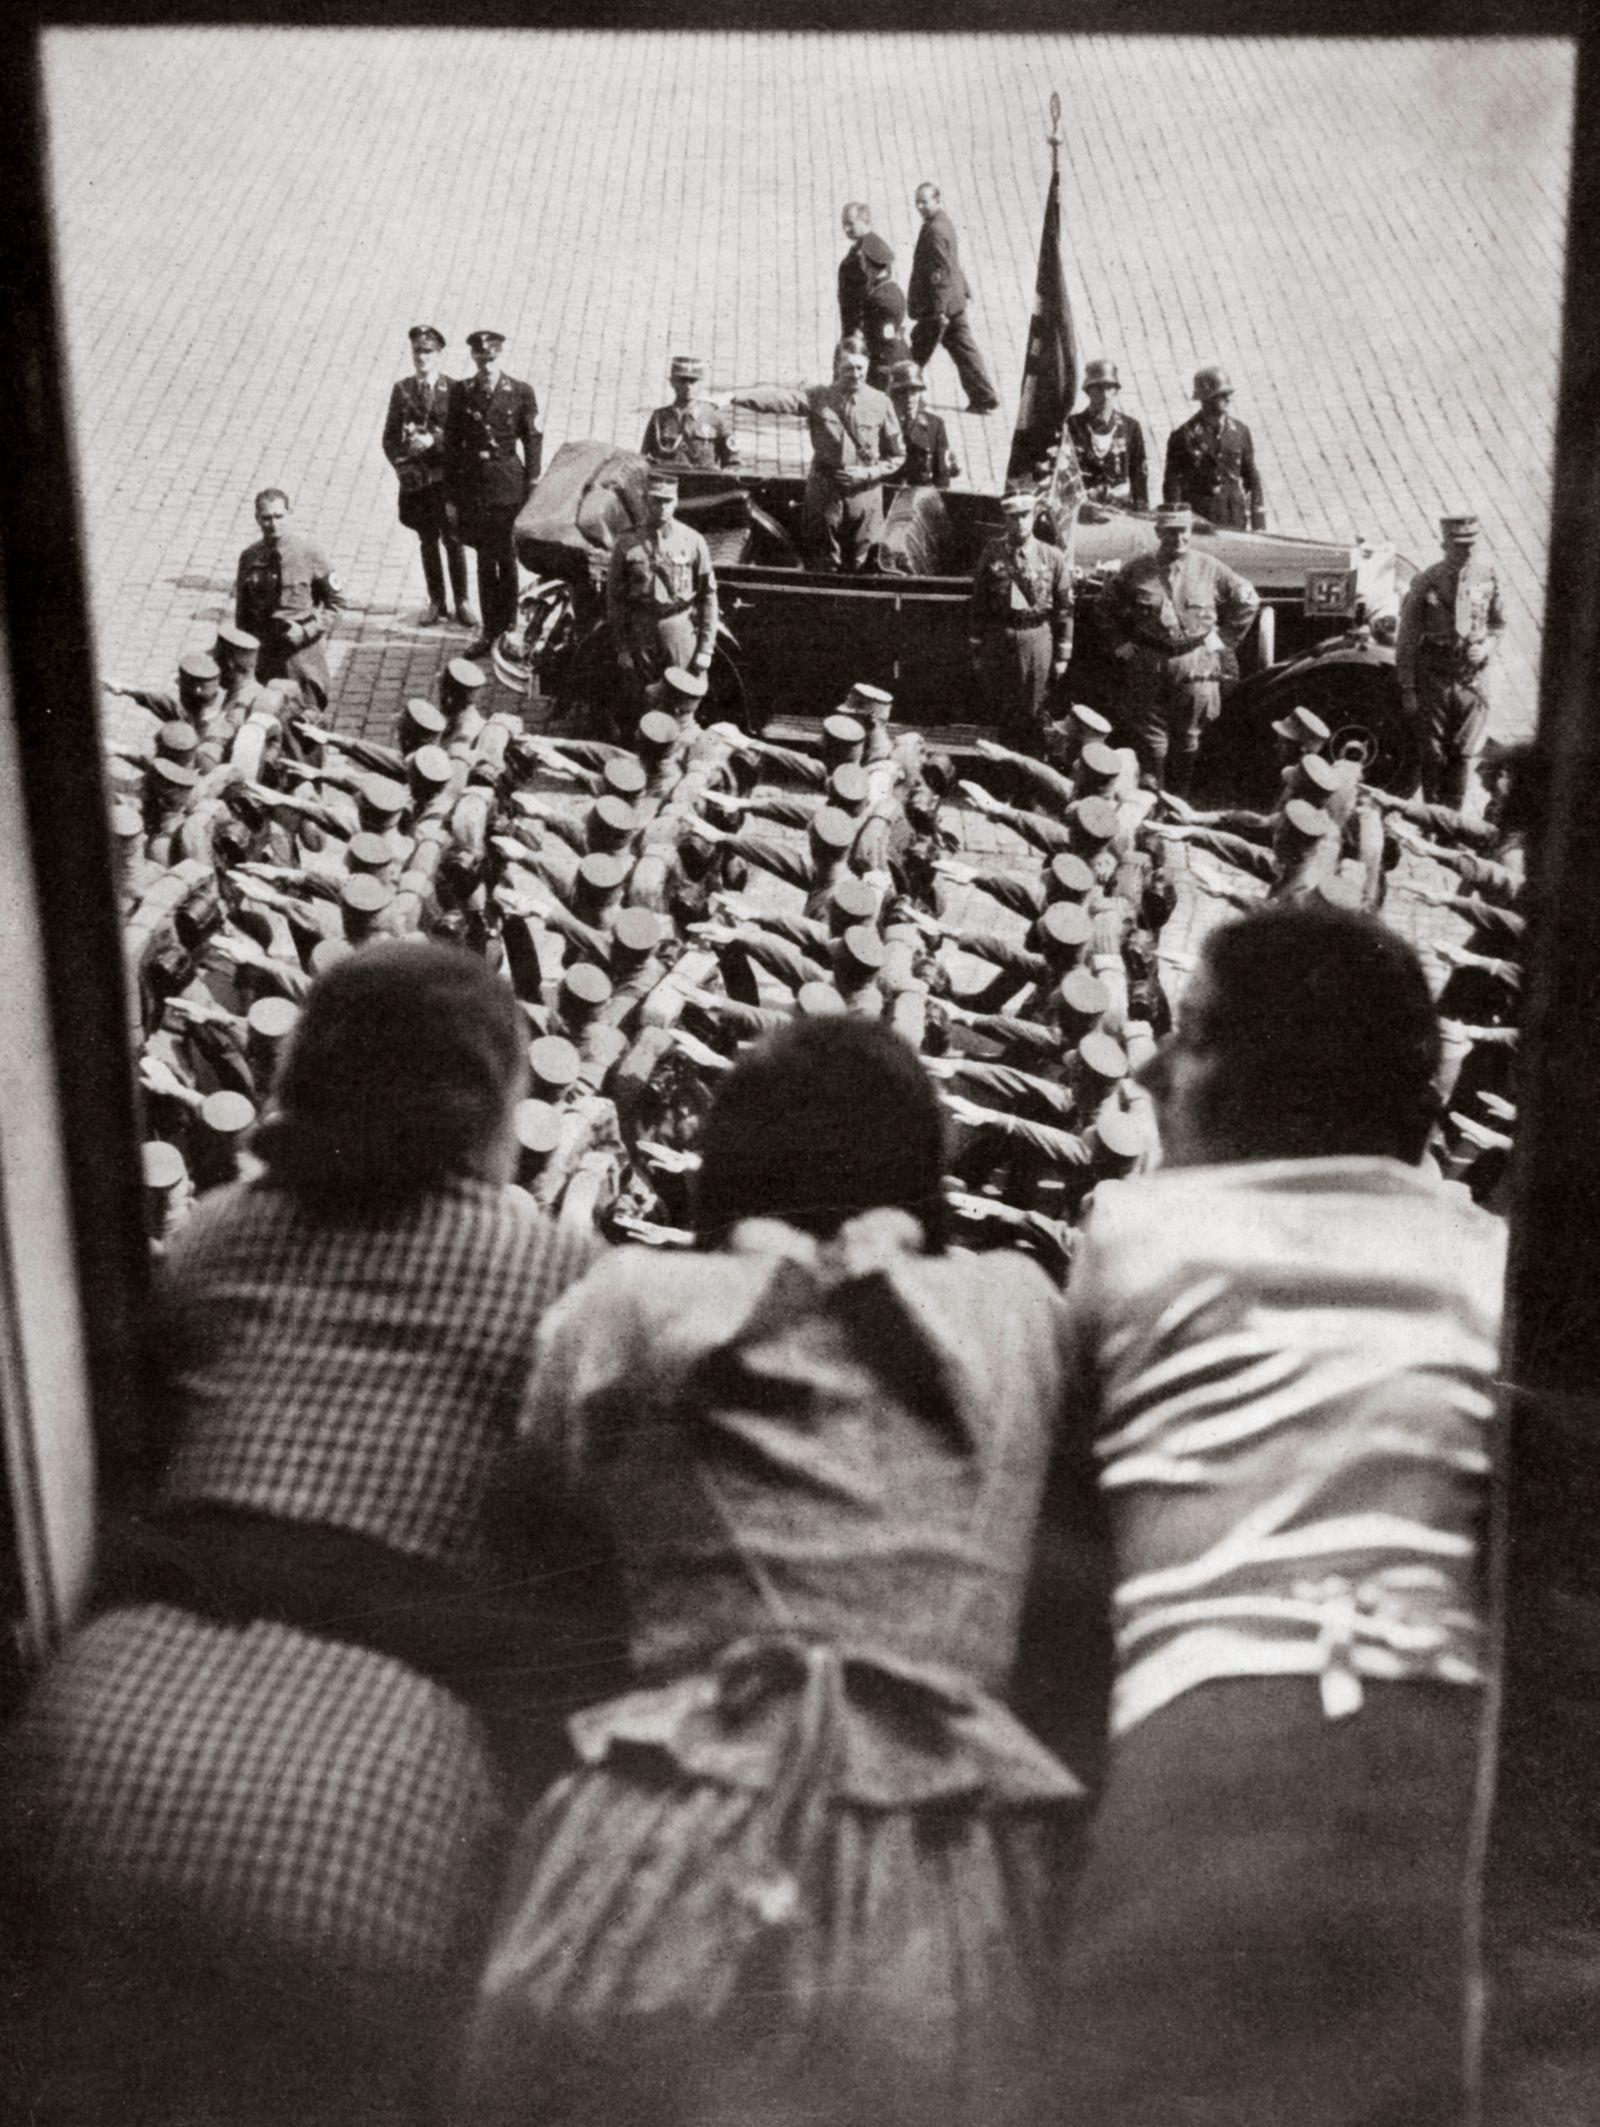 Three Girls Watching The Traditional Parade Of SA Stormtroopers Nuremberg Germany circa 1923-1938